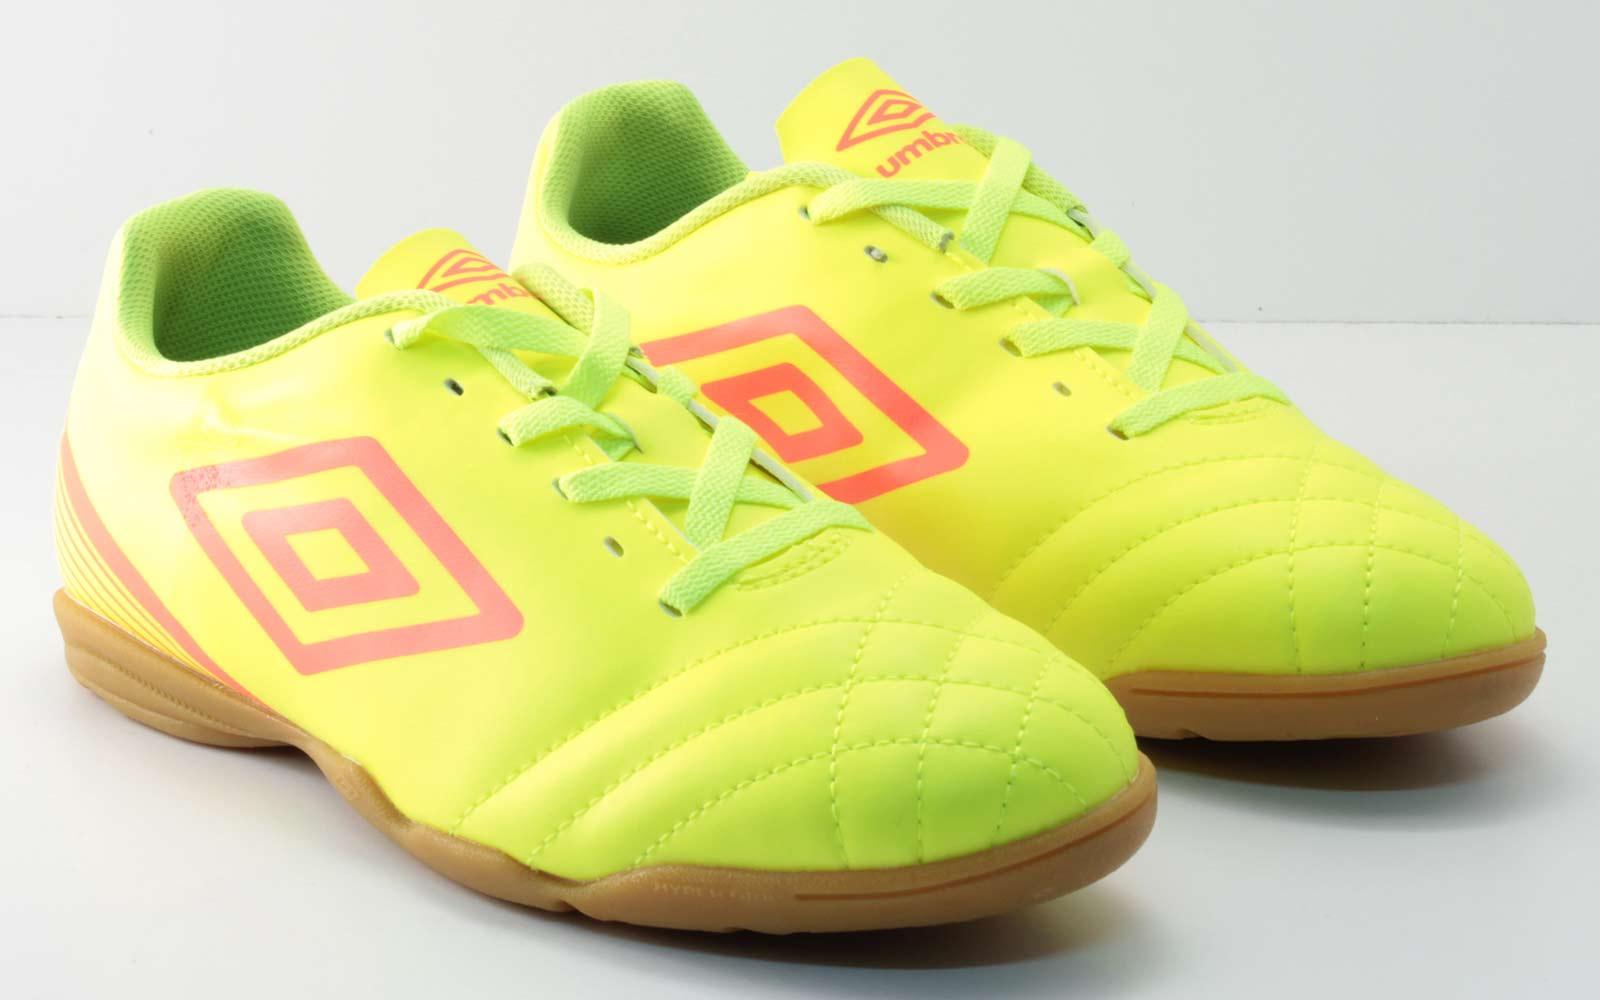 Chuteira Umbro Striker 3 Futsal Indoor Masculino 0F72058  6e31856b38621